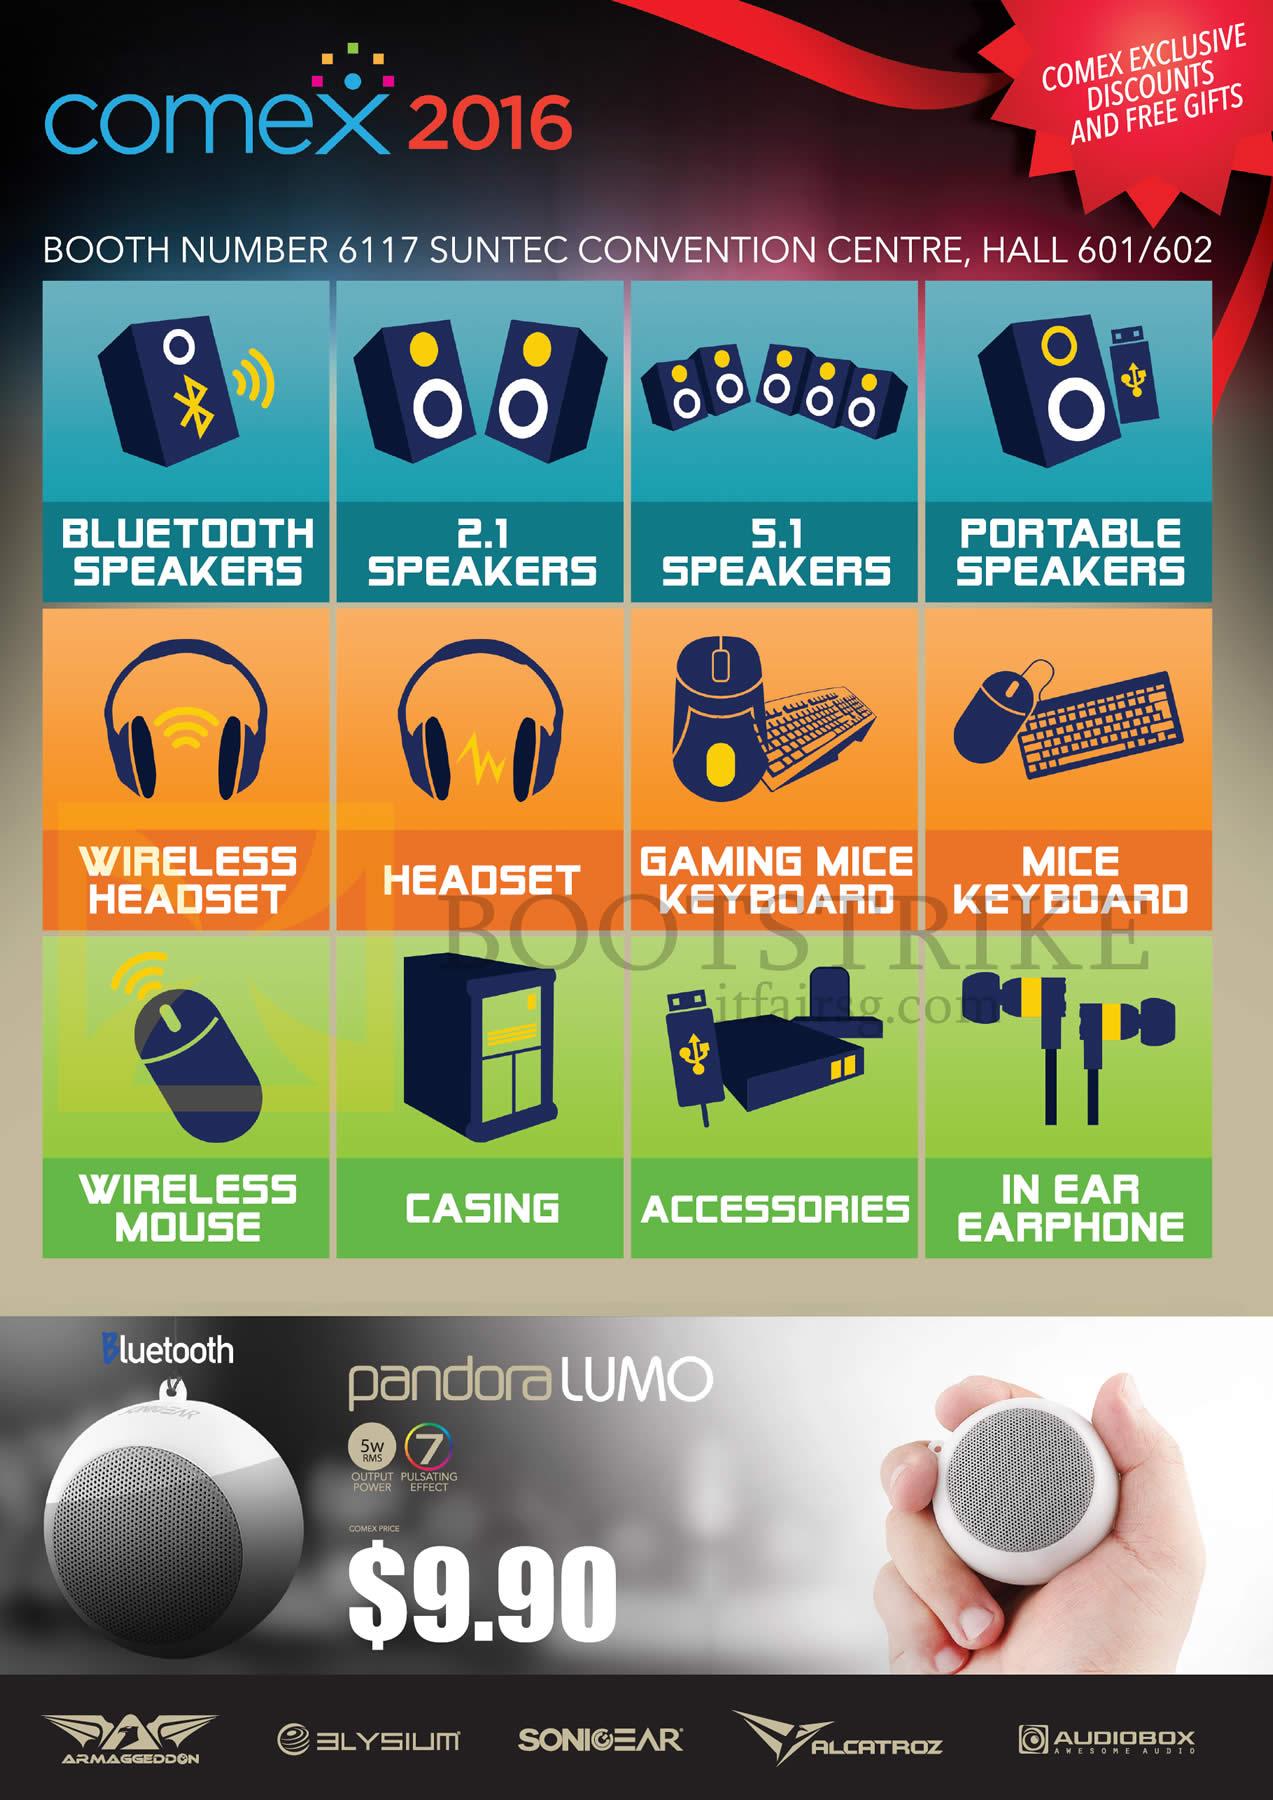 COMEX 2016 price list image brochure of Leapfrog Speakers, Keyboard, Headset, Earphone, Accessories, Mouse, Pandora Lumo